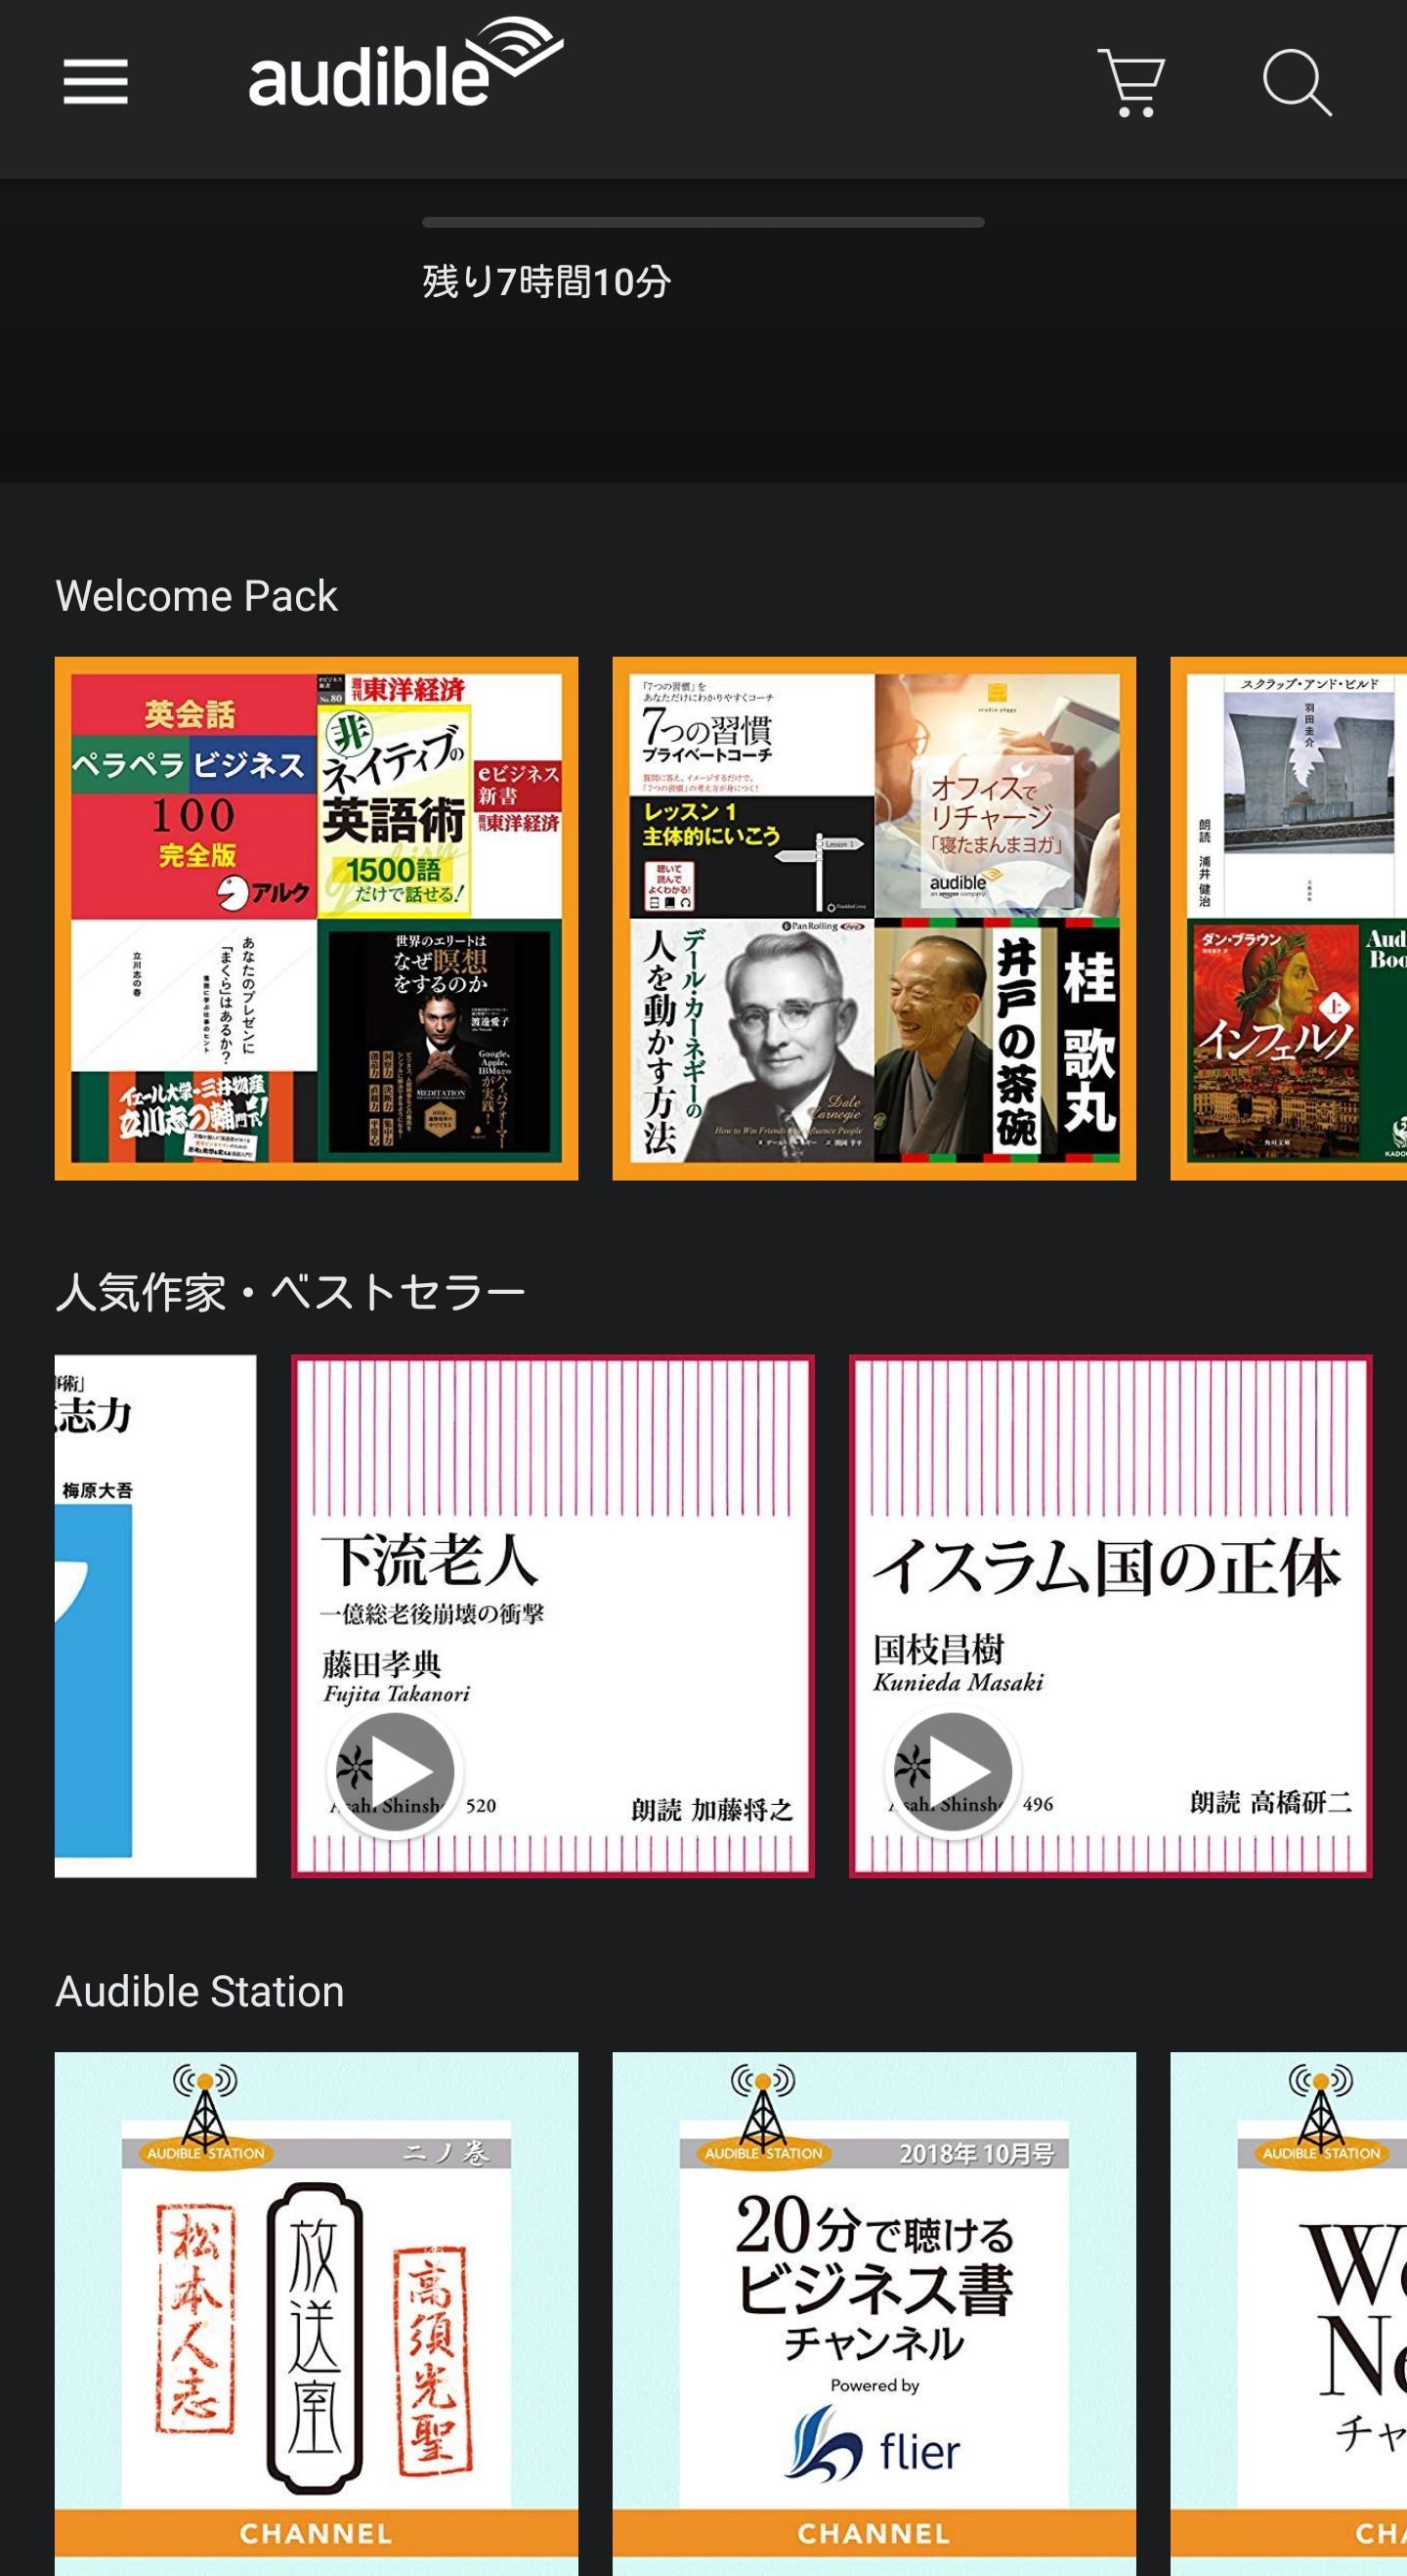 f:id:Re_hirose:20181020100137j:image